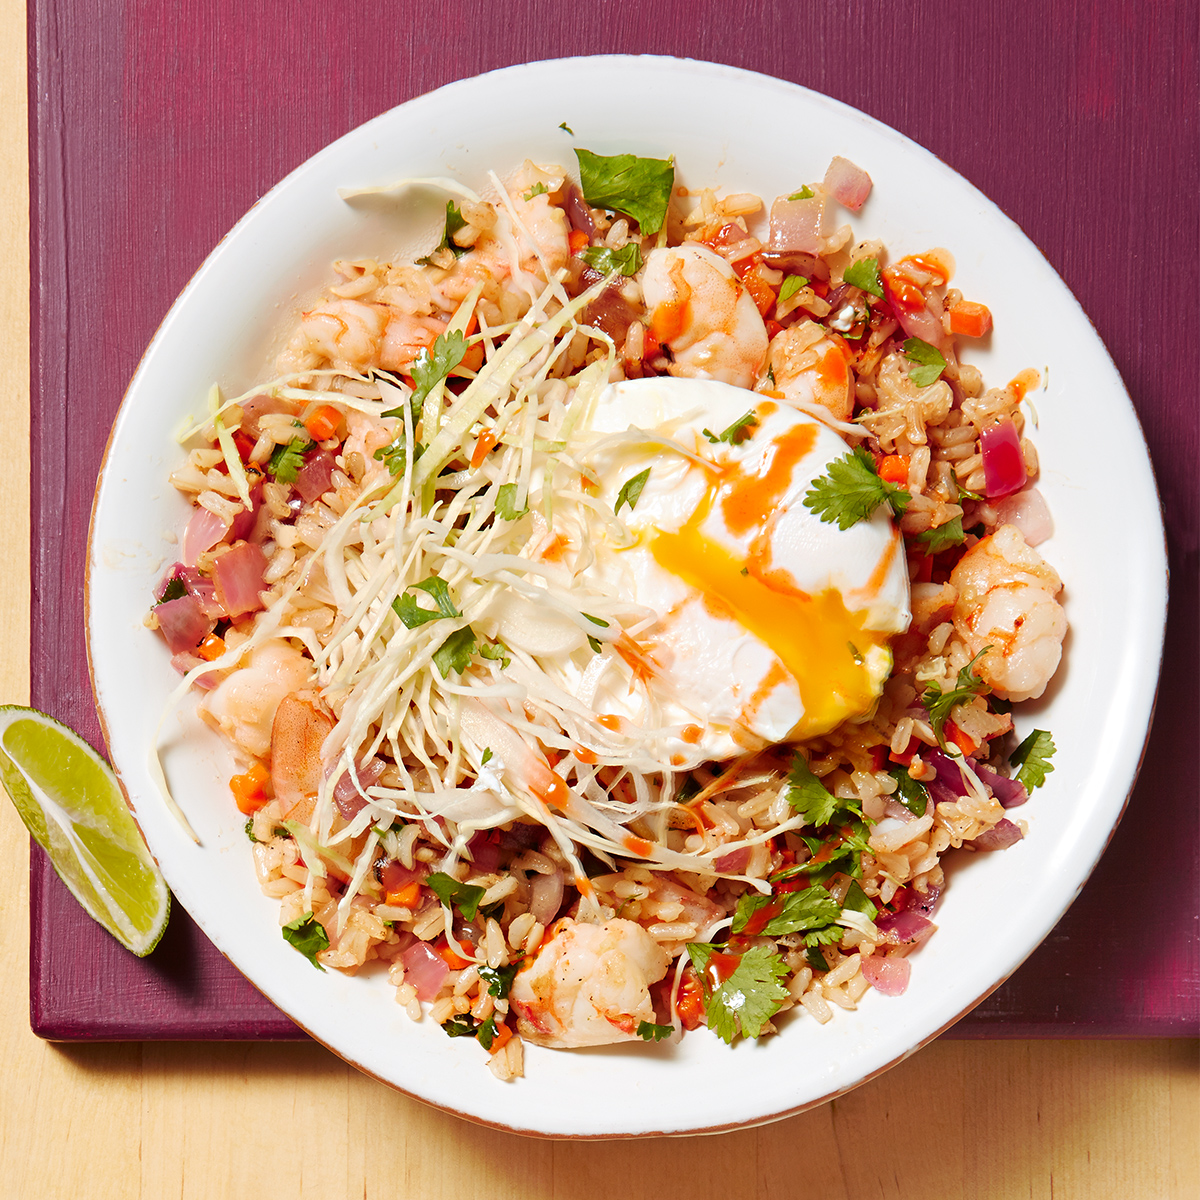 Spicy Shrimp & Brown Rice Bowl